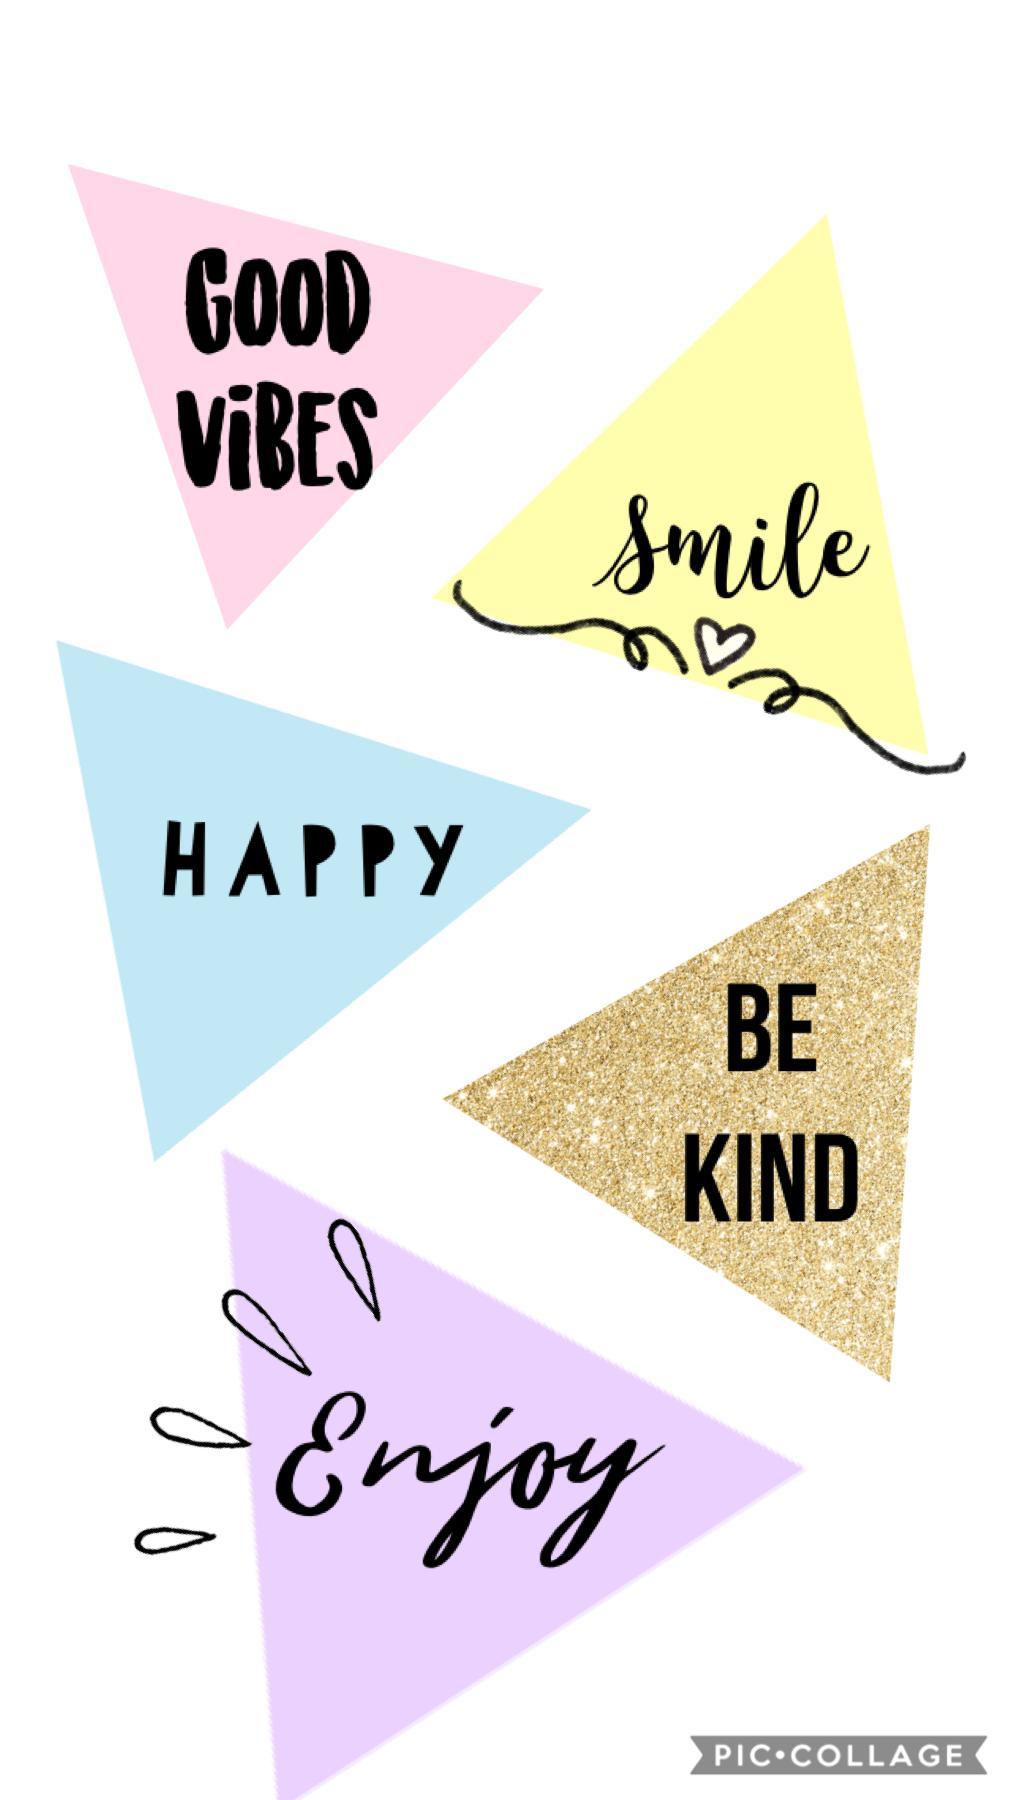 Remember to enjoy life 💗💗💗